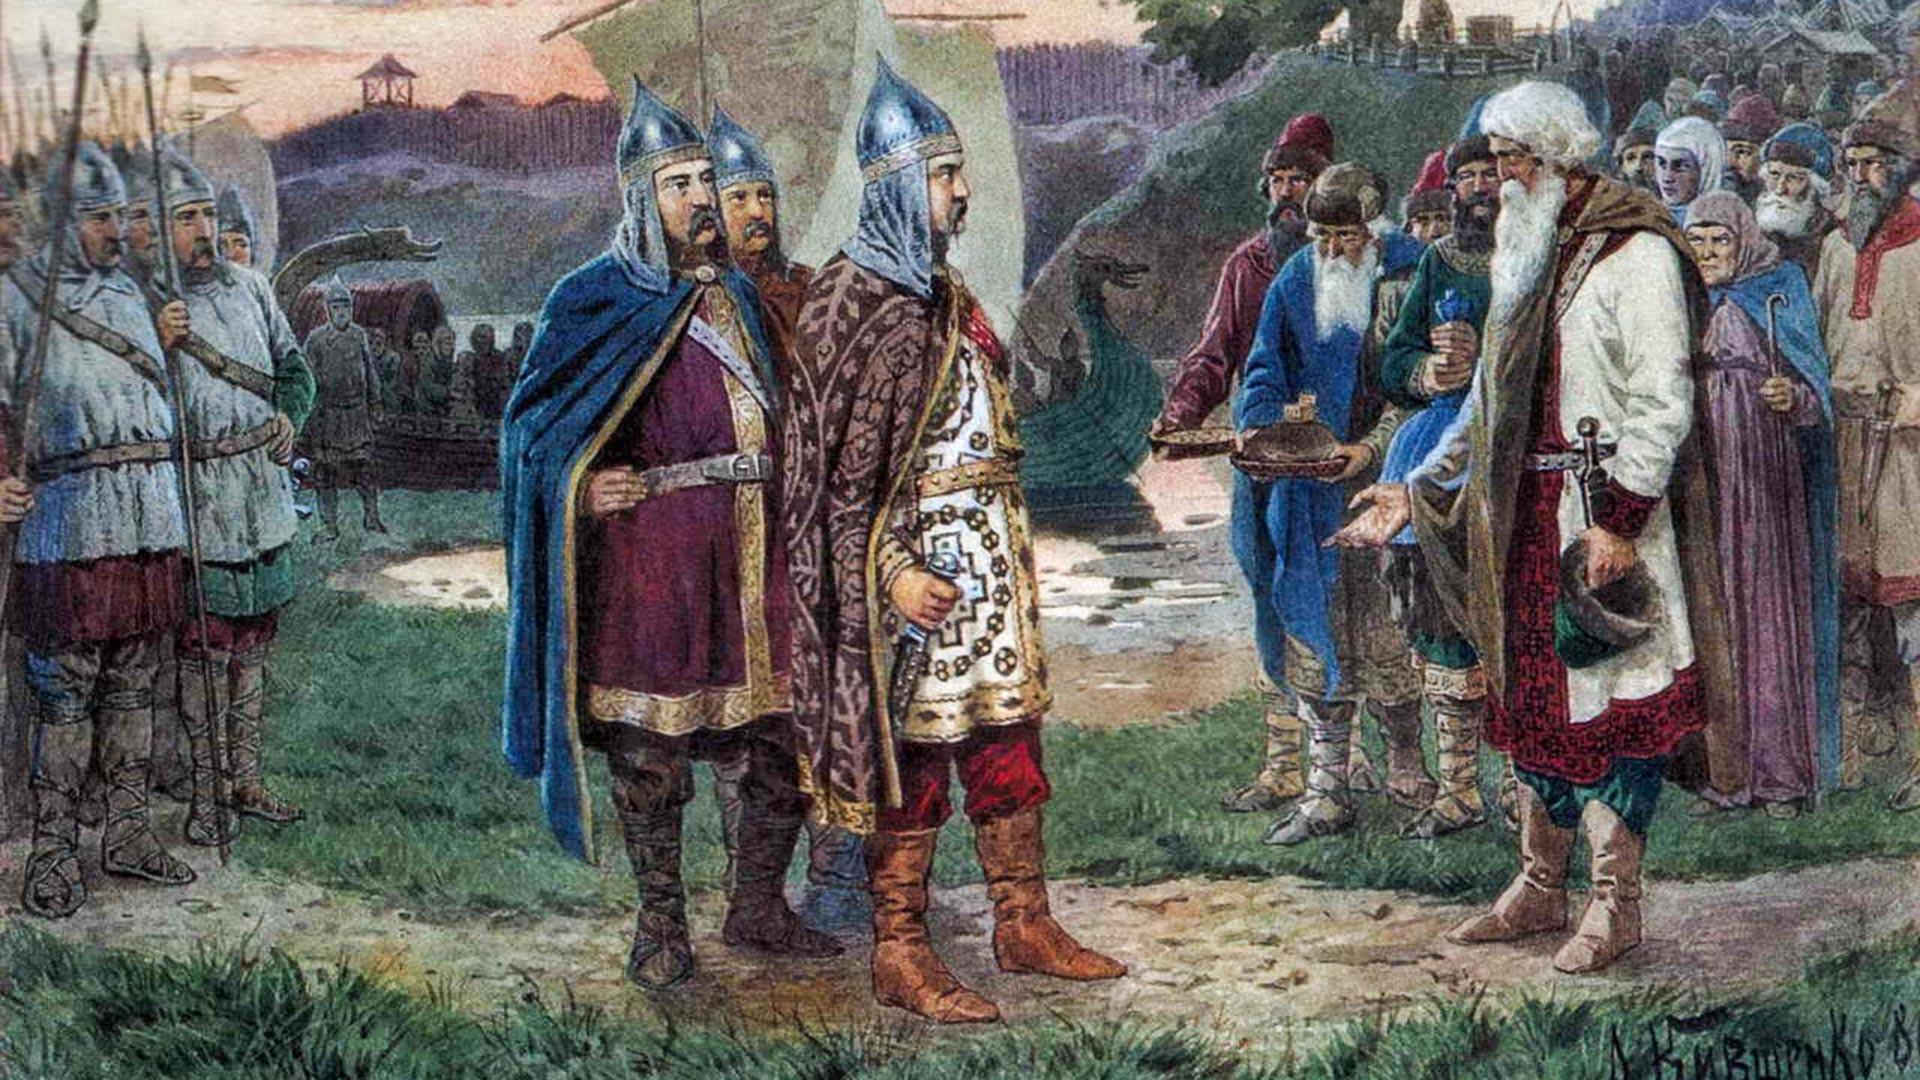 """Pemanggilan orang-orang Varangia"" oleh Aleksey Kivshenko"